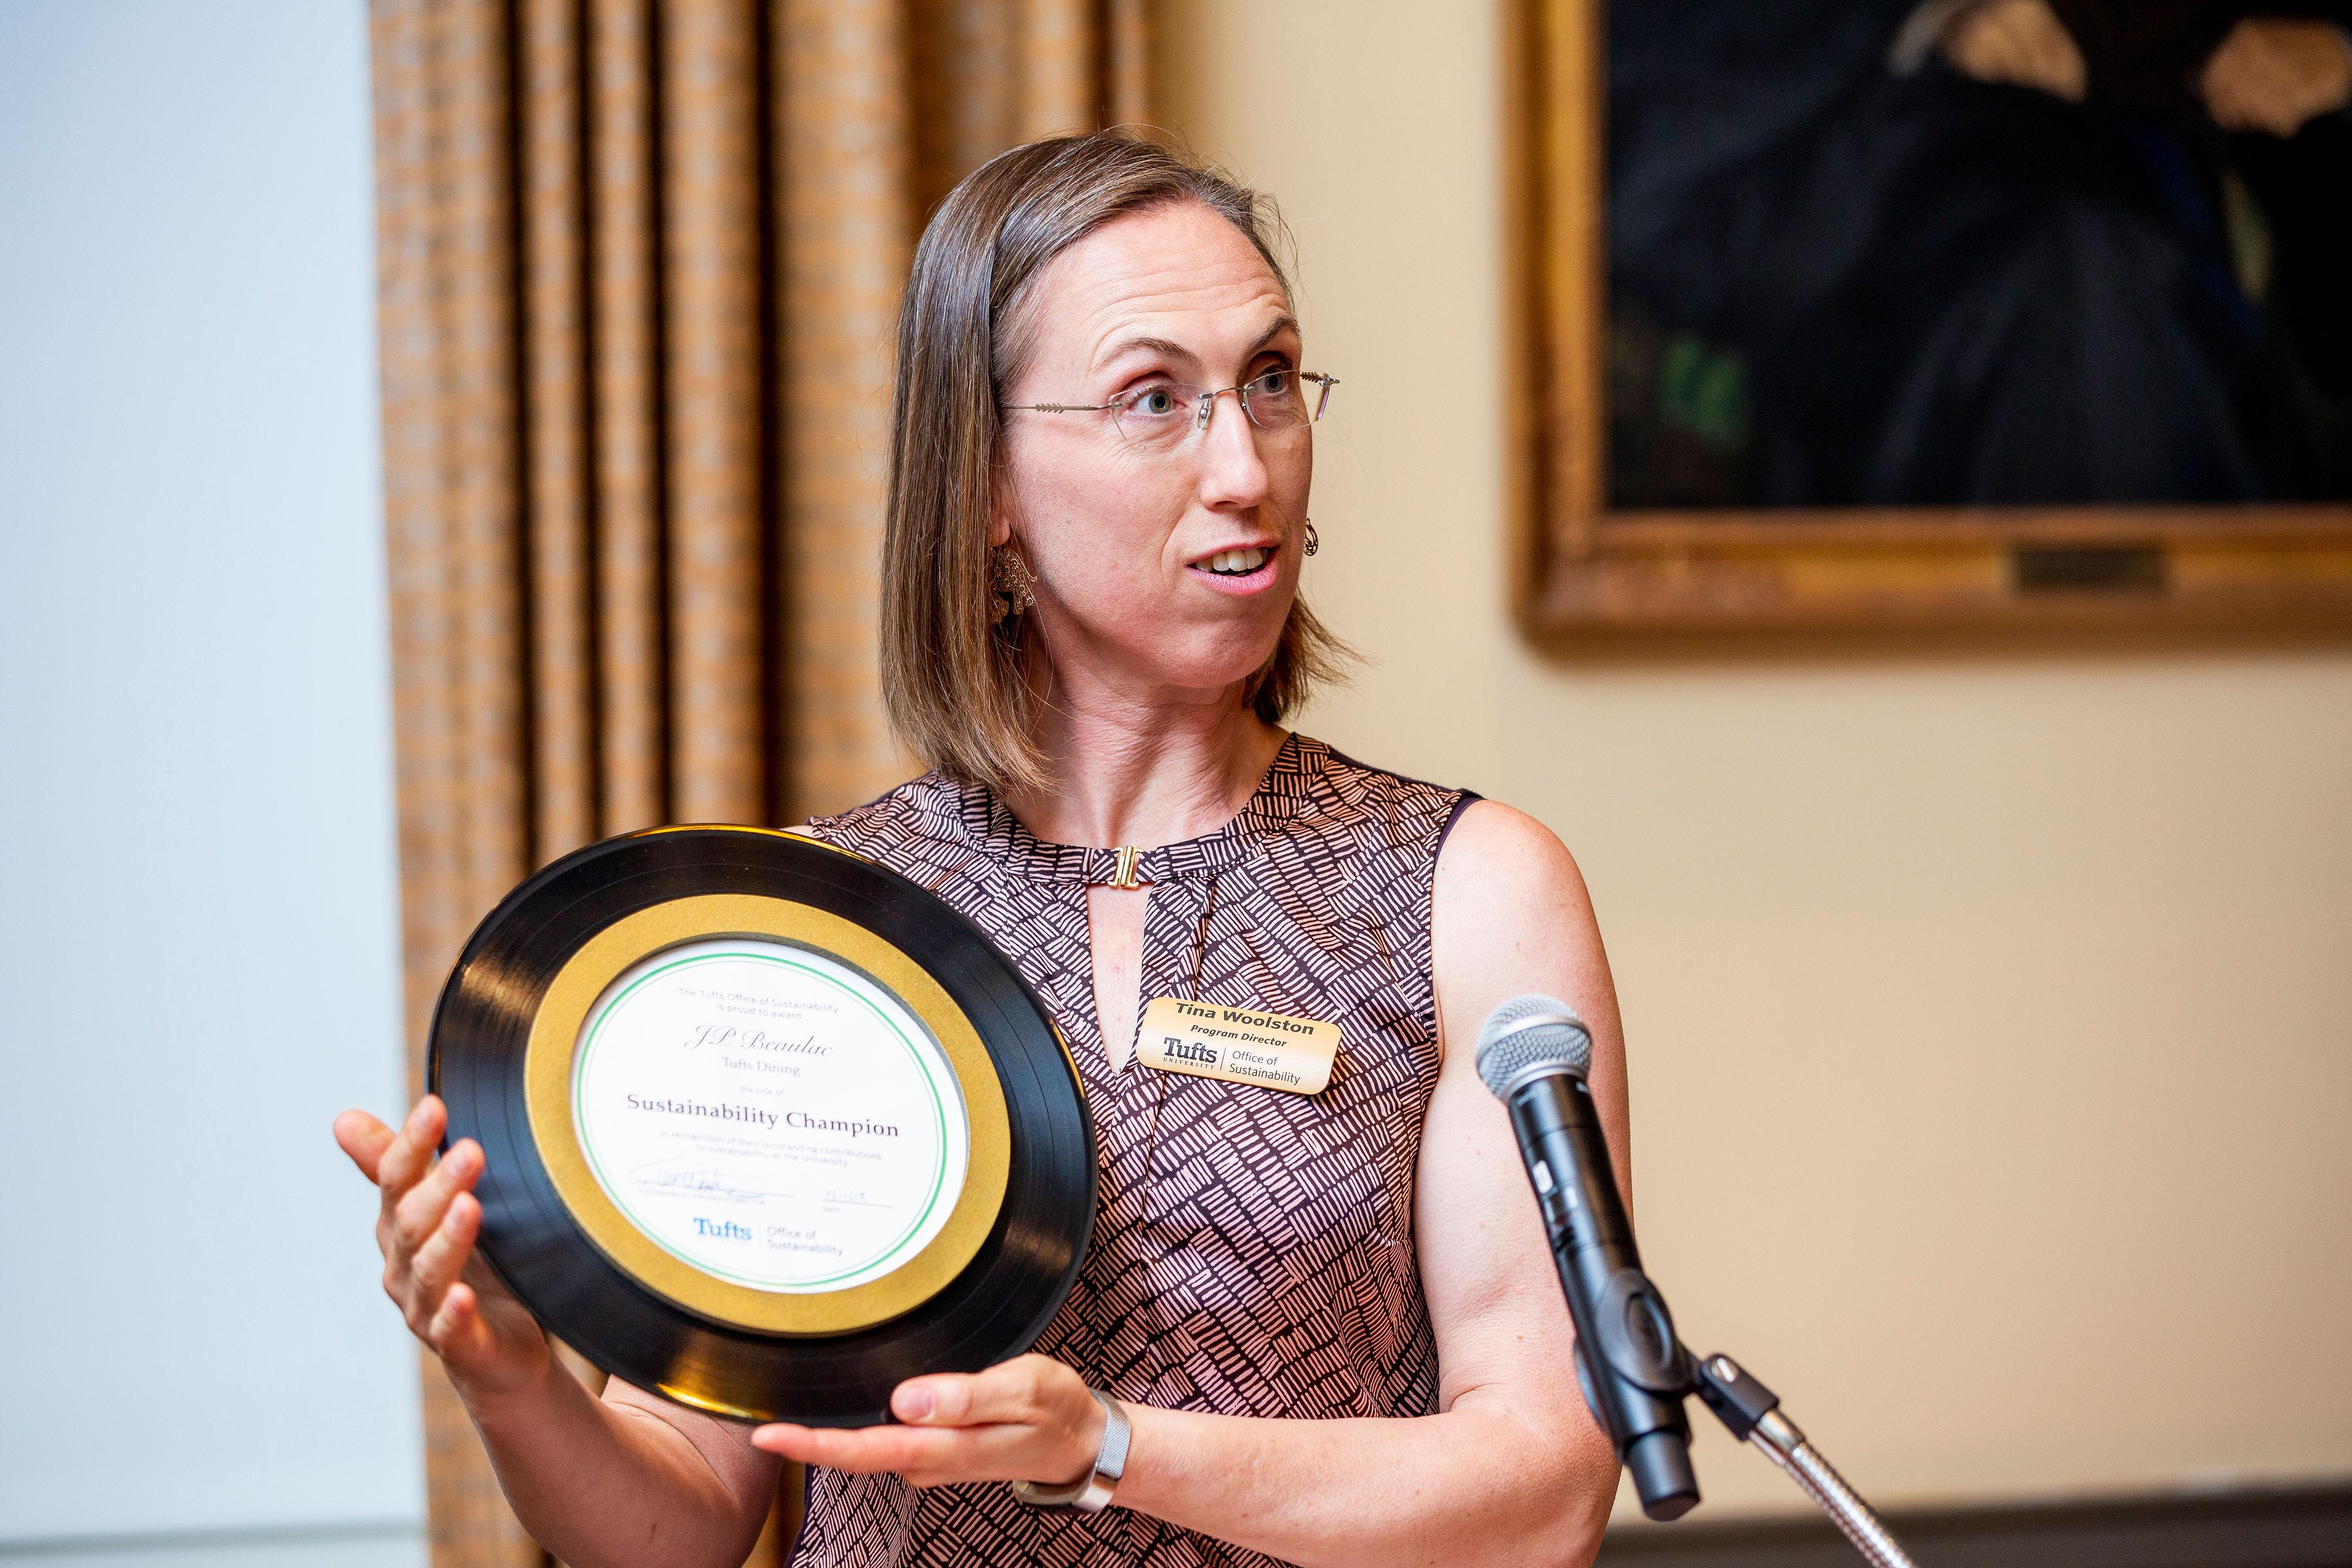 Tina holding Sustainability Champion award